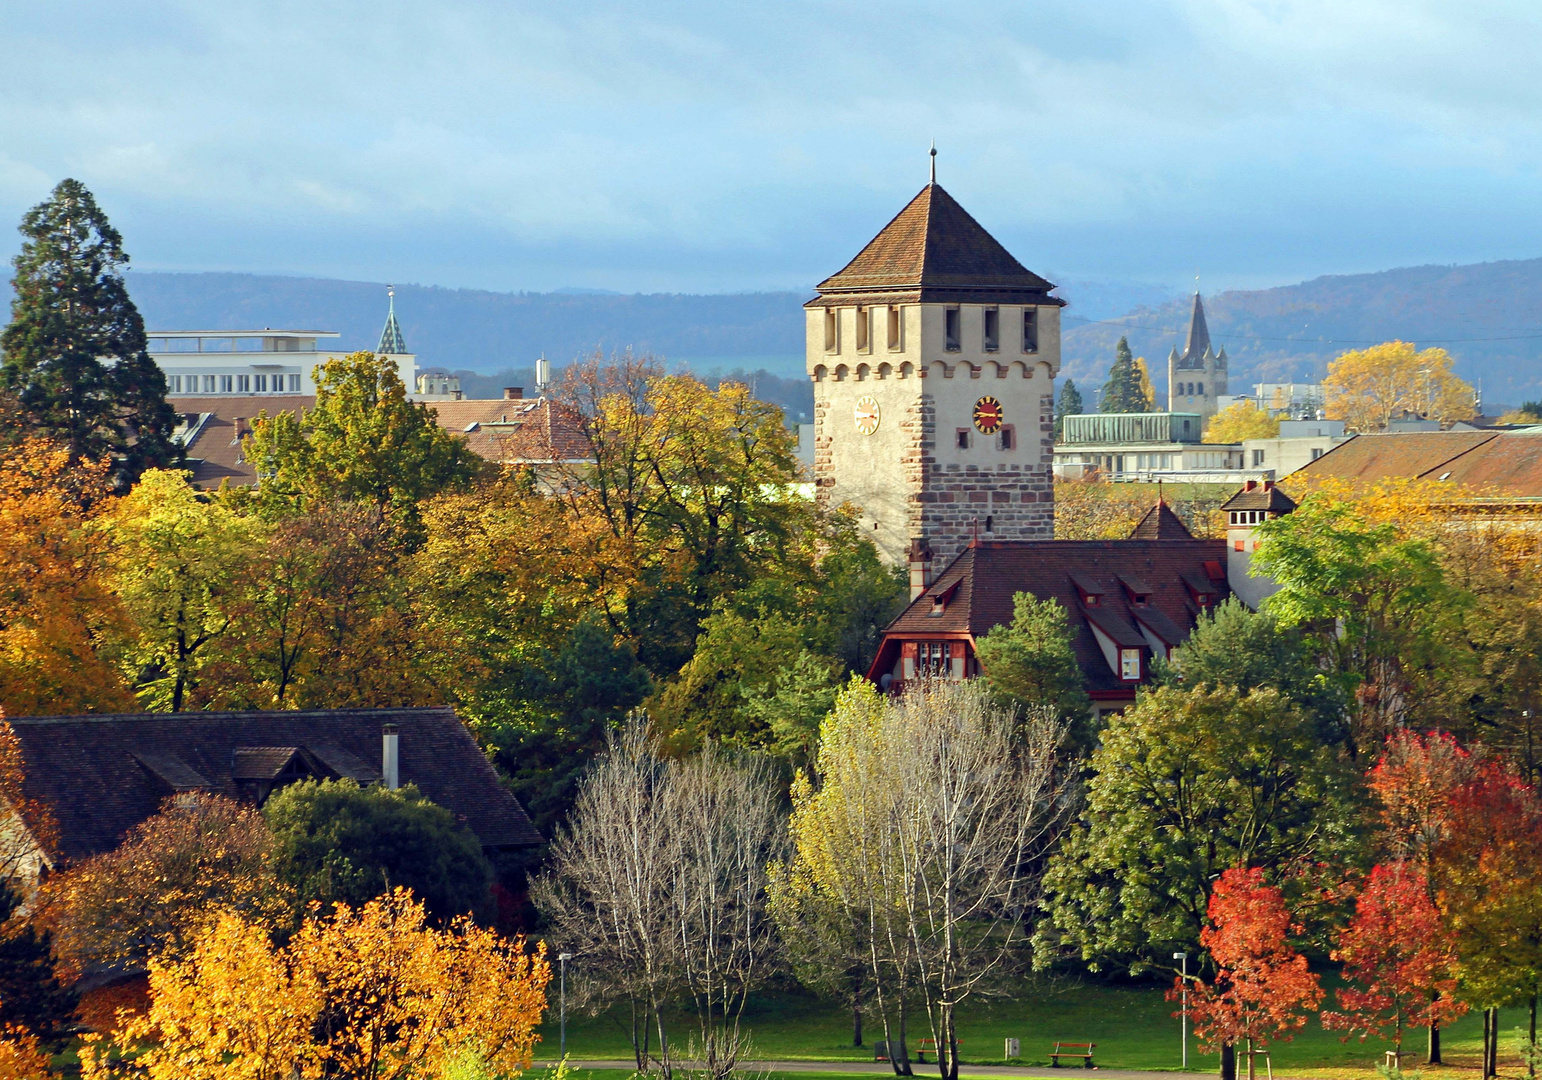 St. Johanns- Park